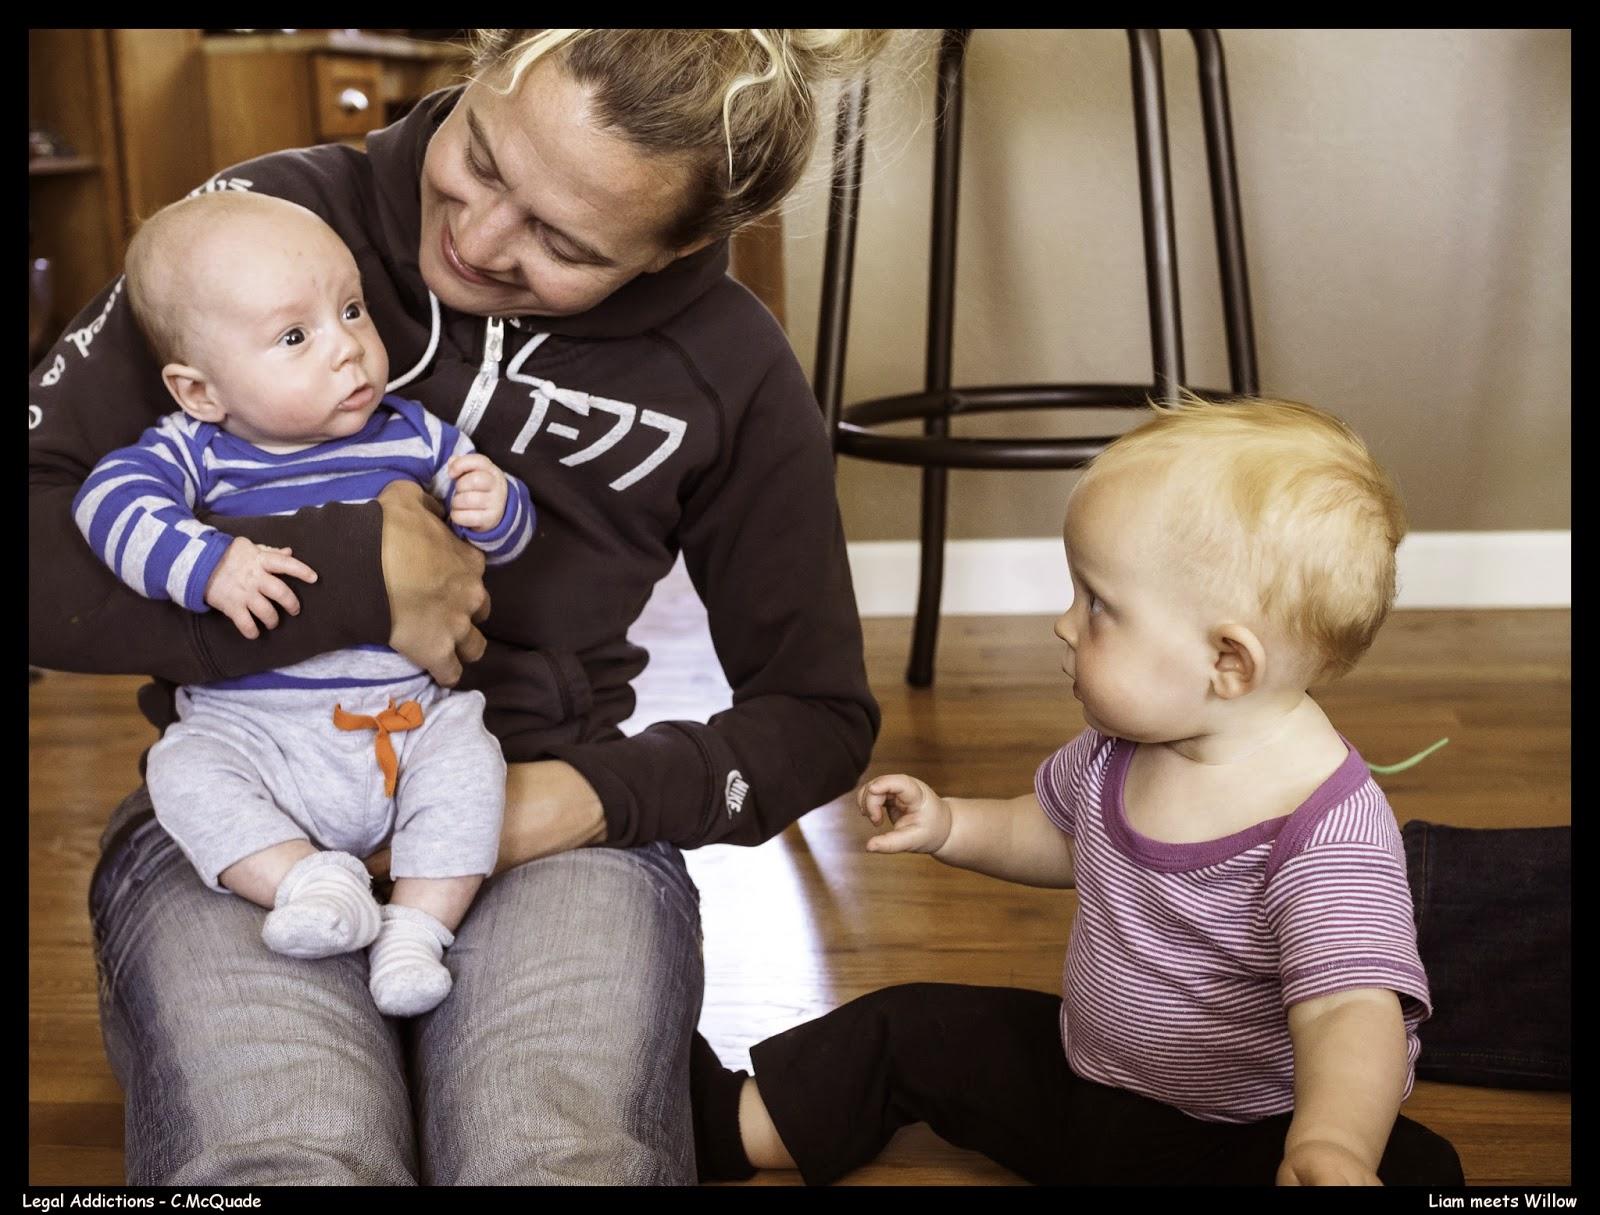 josie+and+kids-20142135.jpg